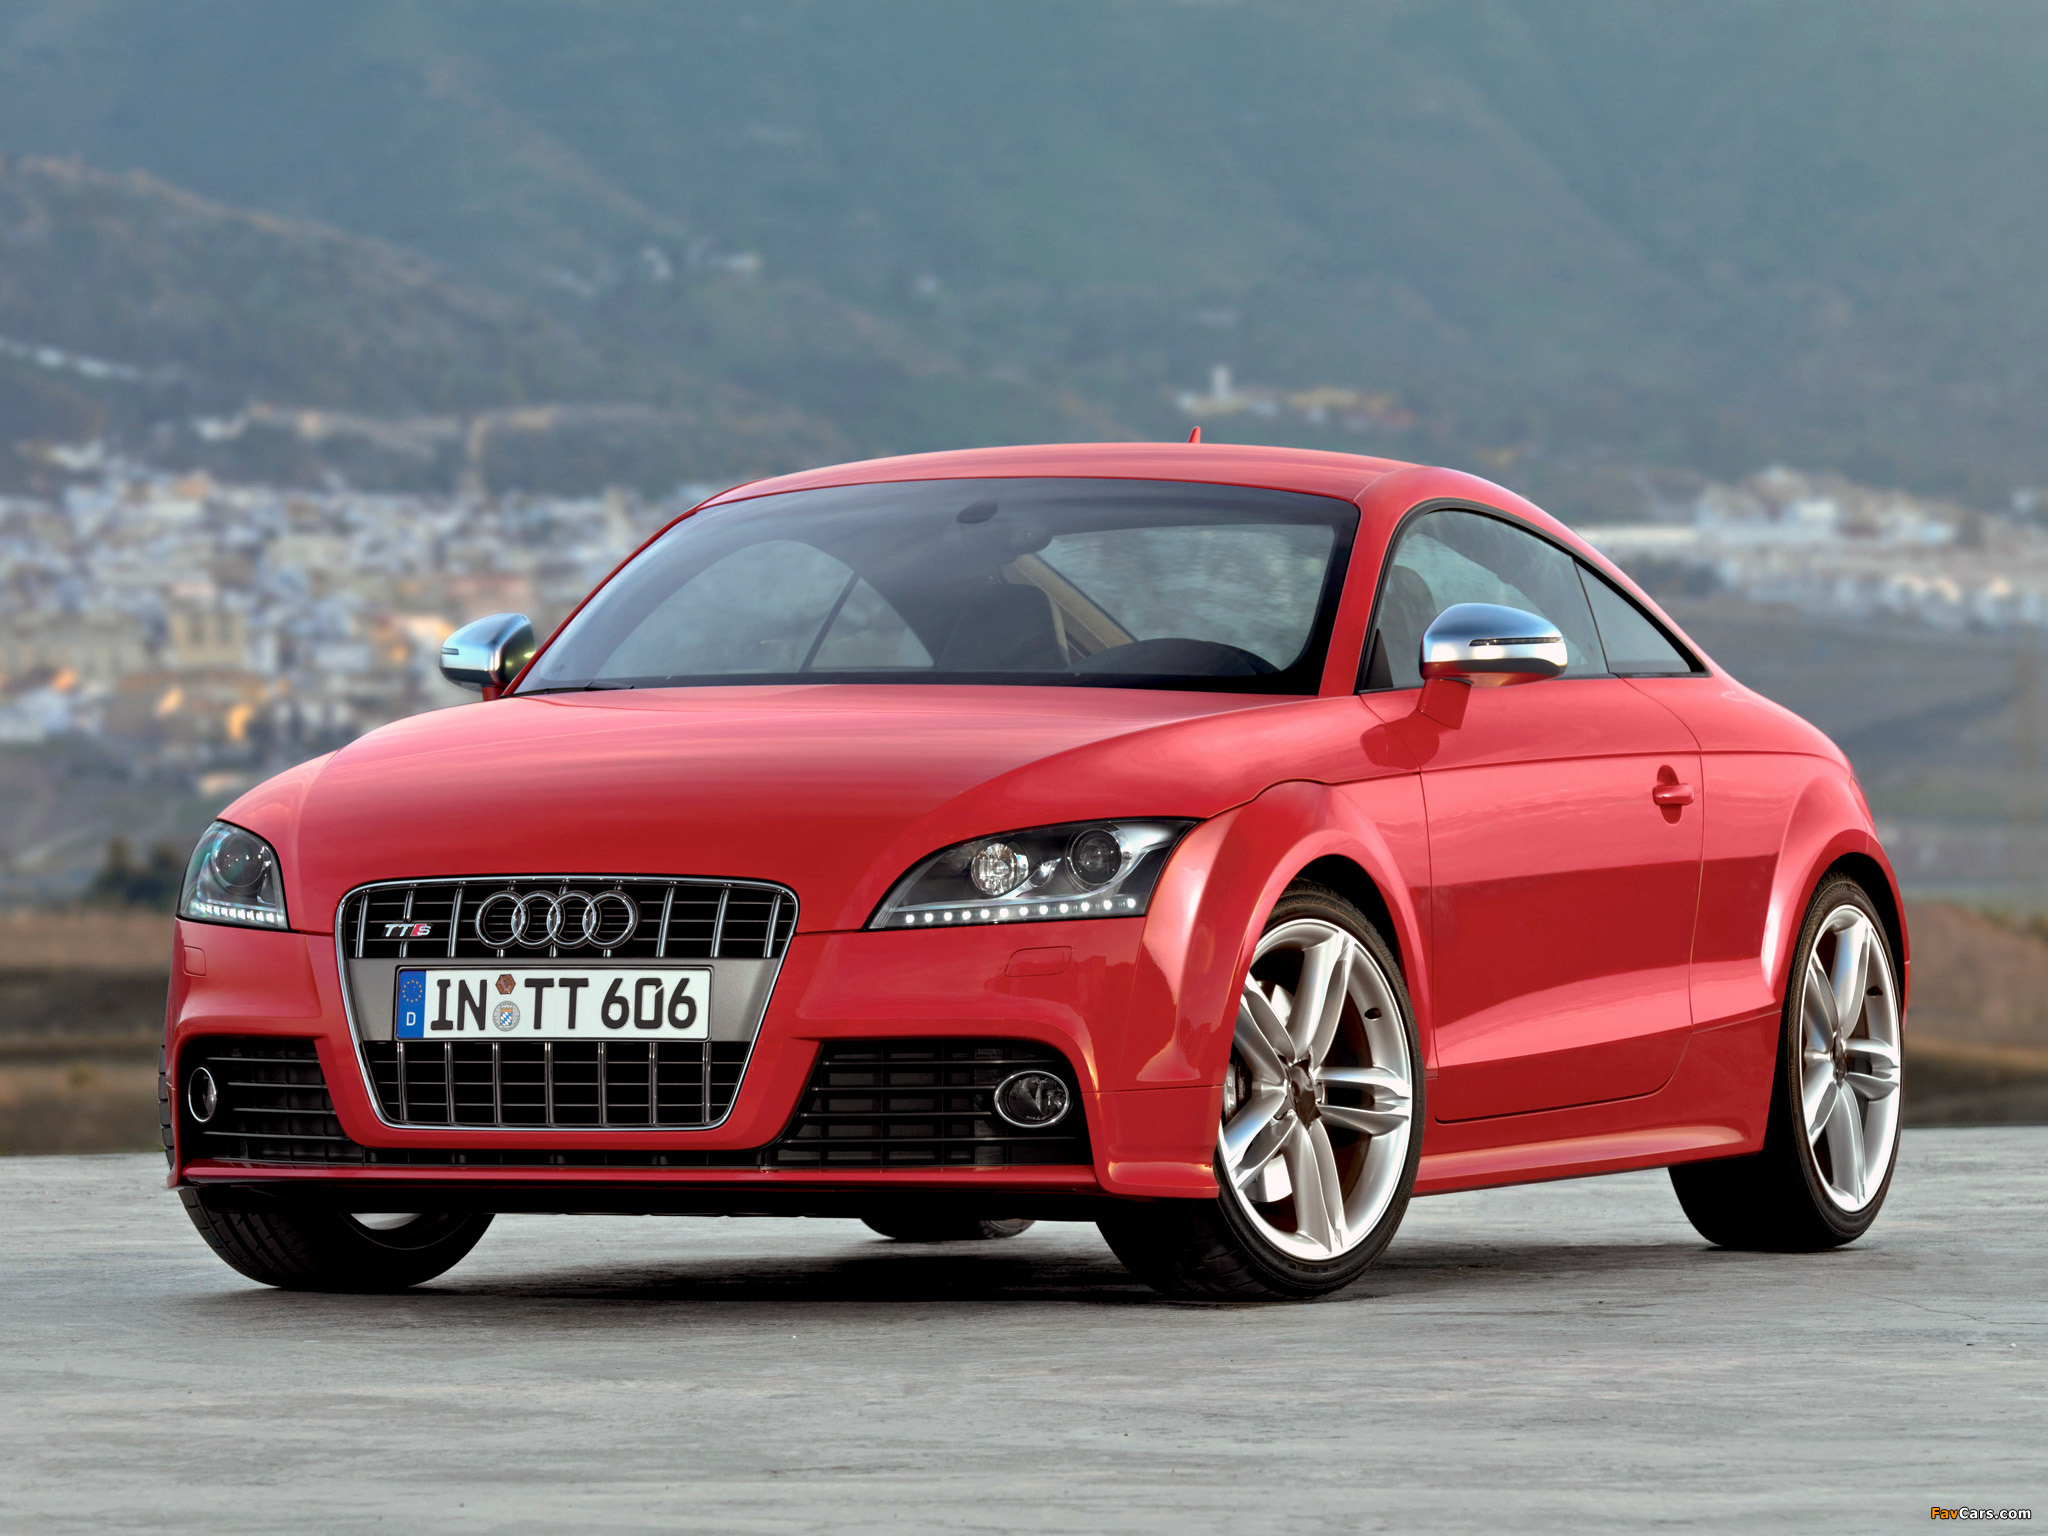 Images Of Audi Tts Coupe 8j 2008 10 2048x1536